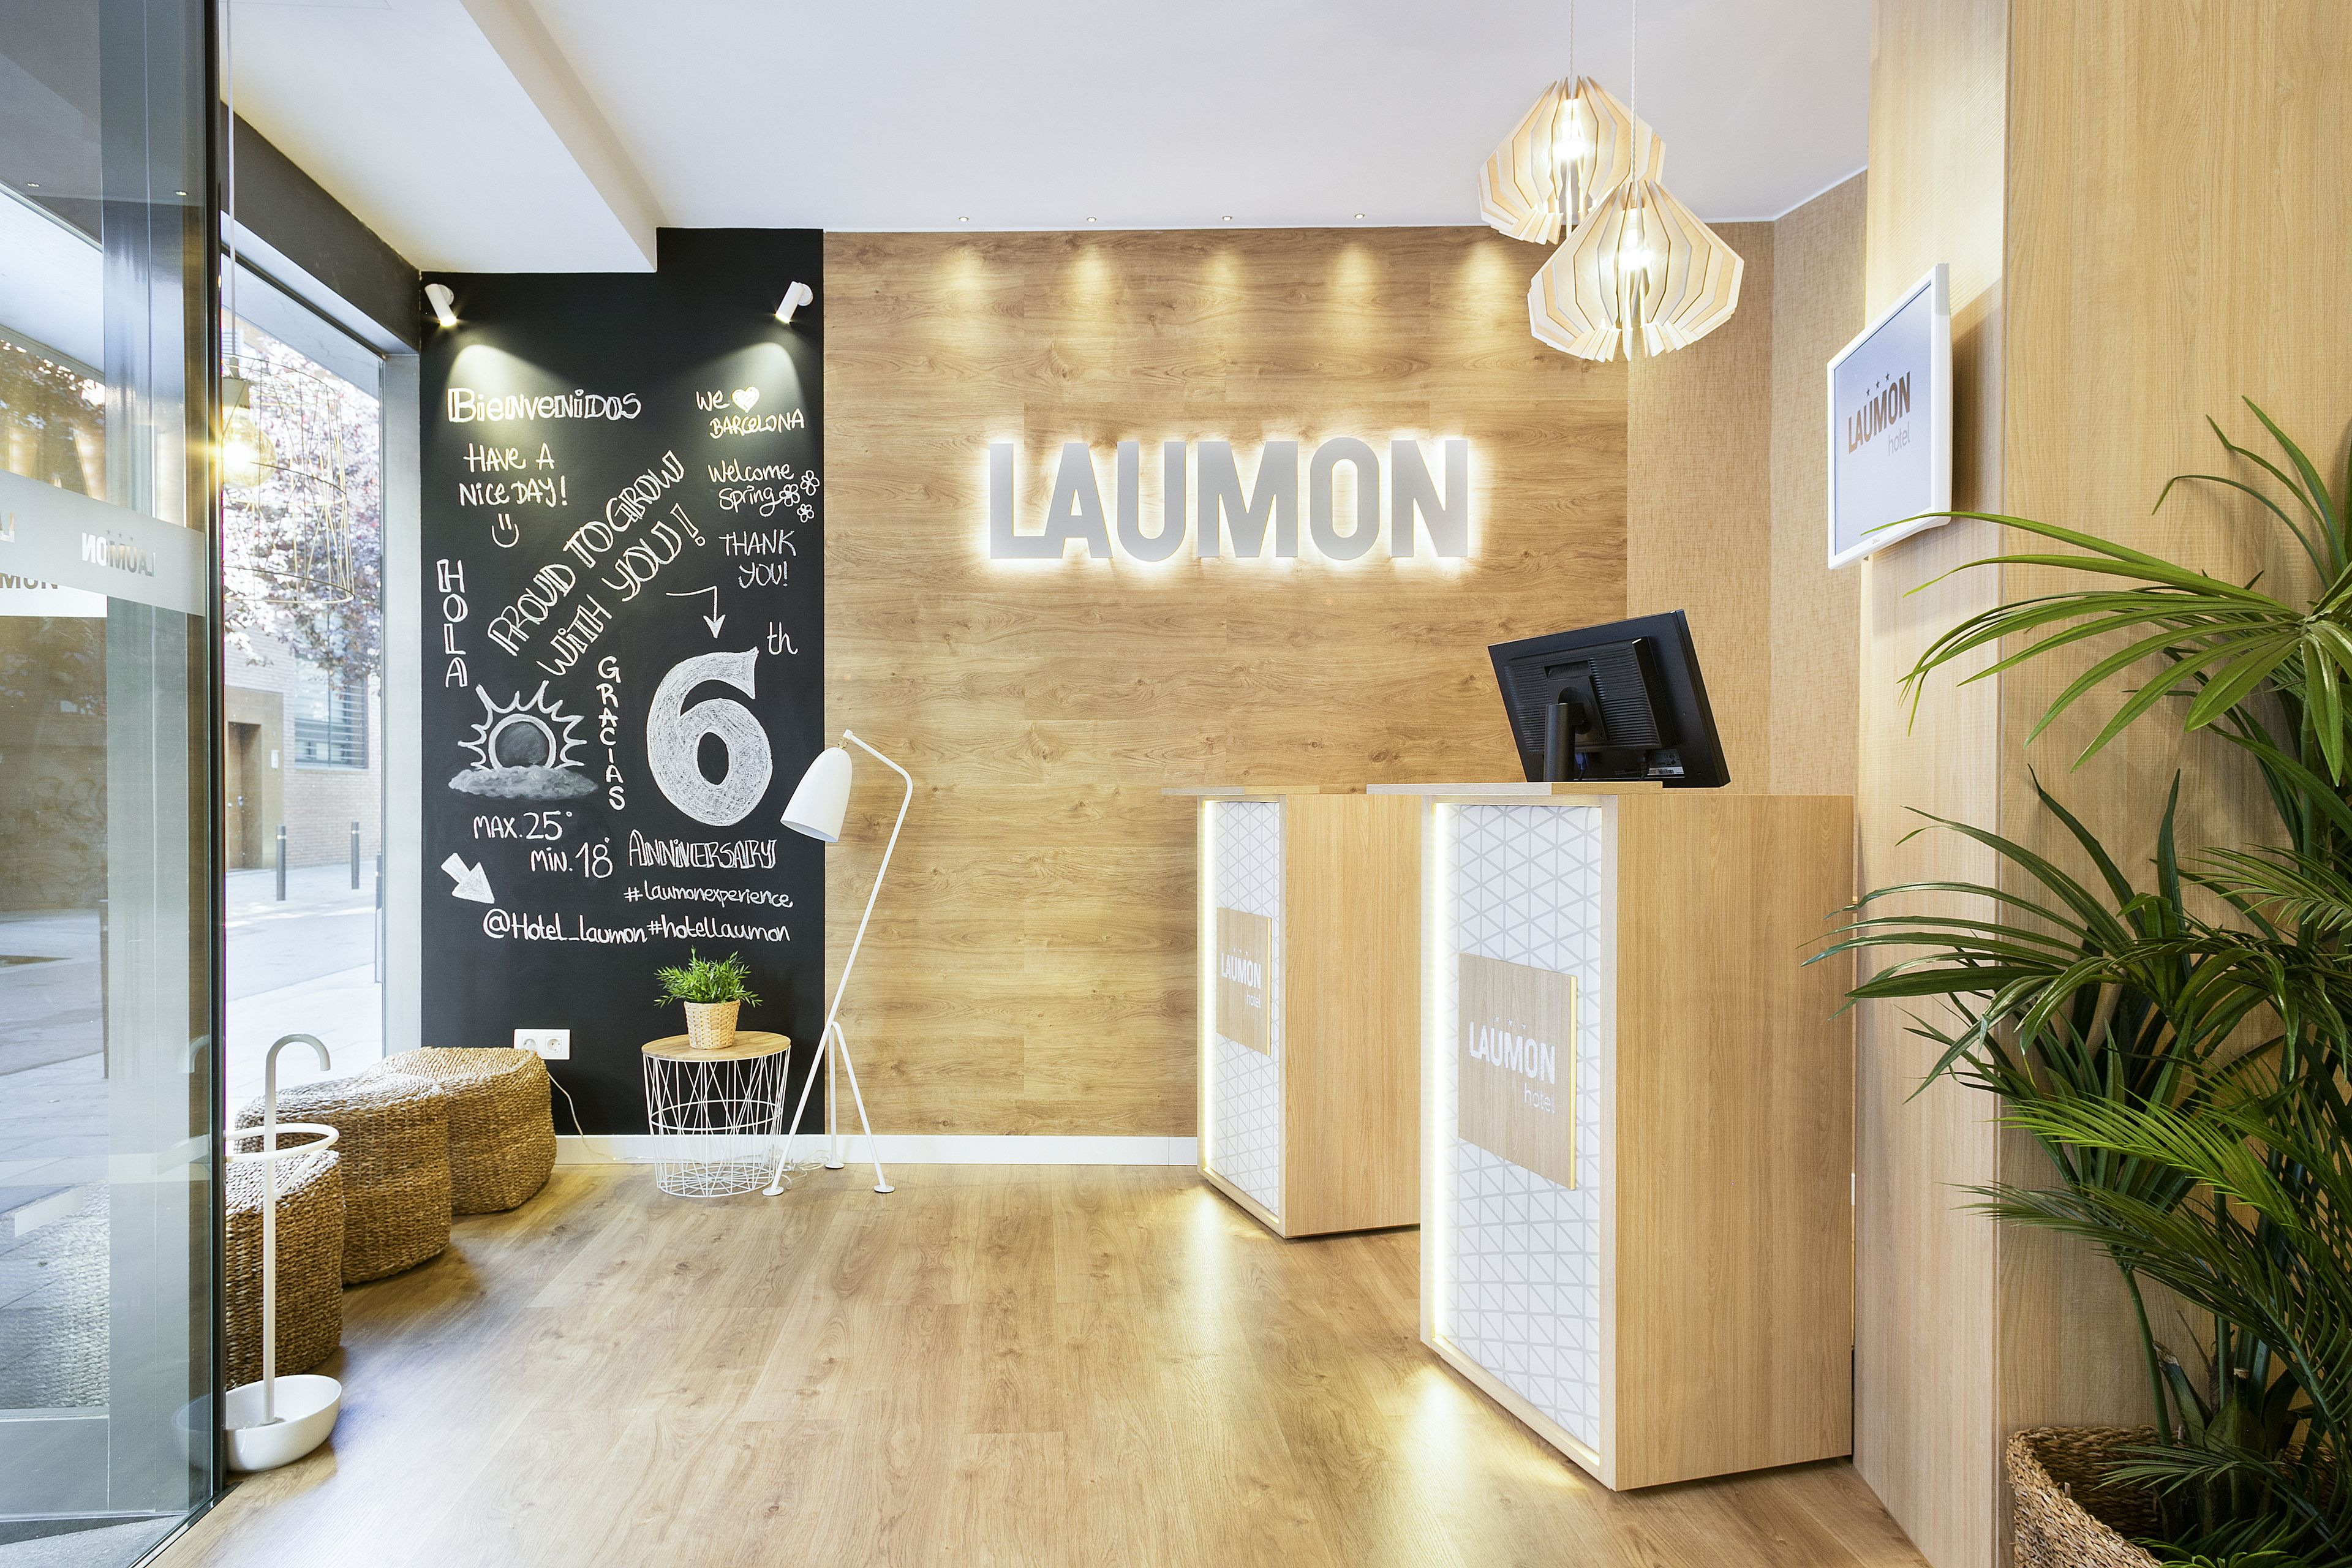 Laumon